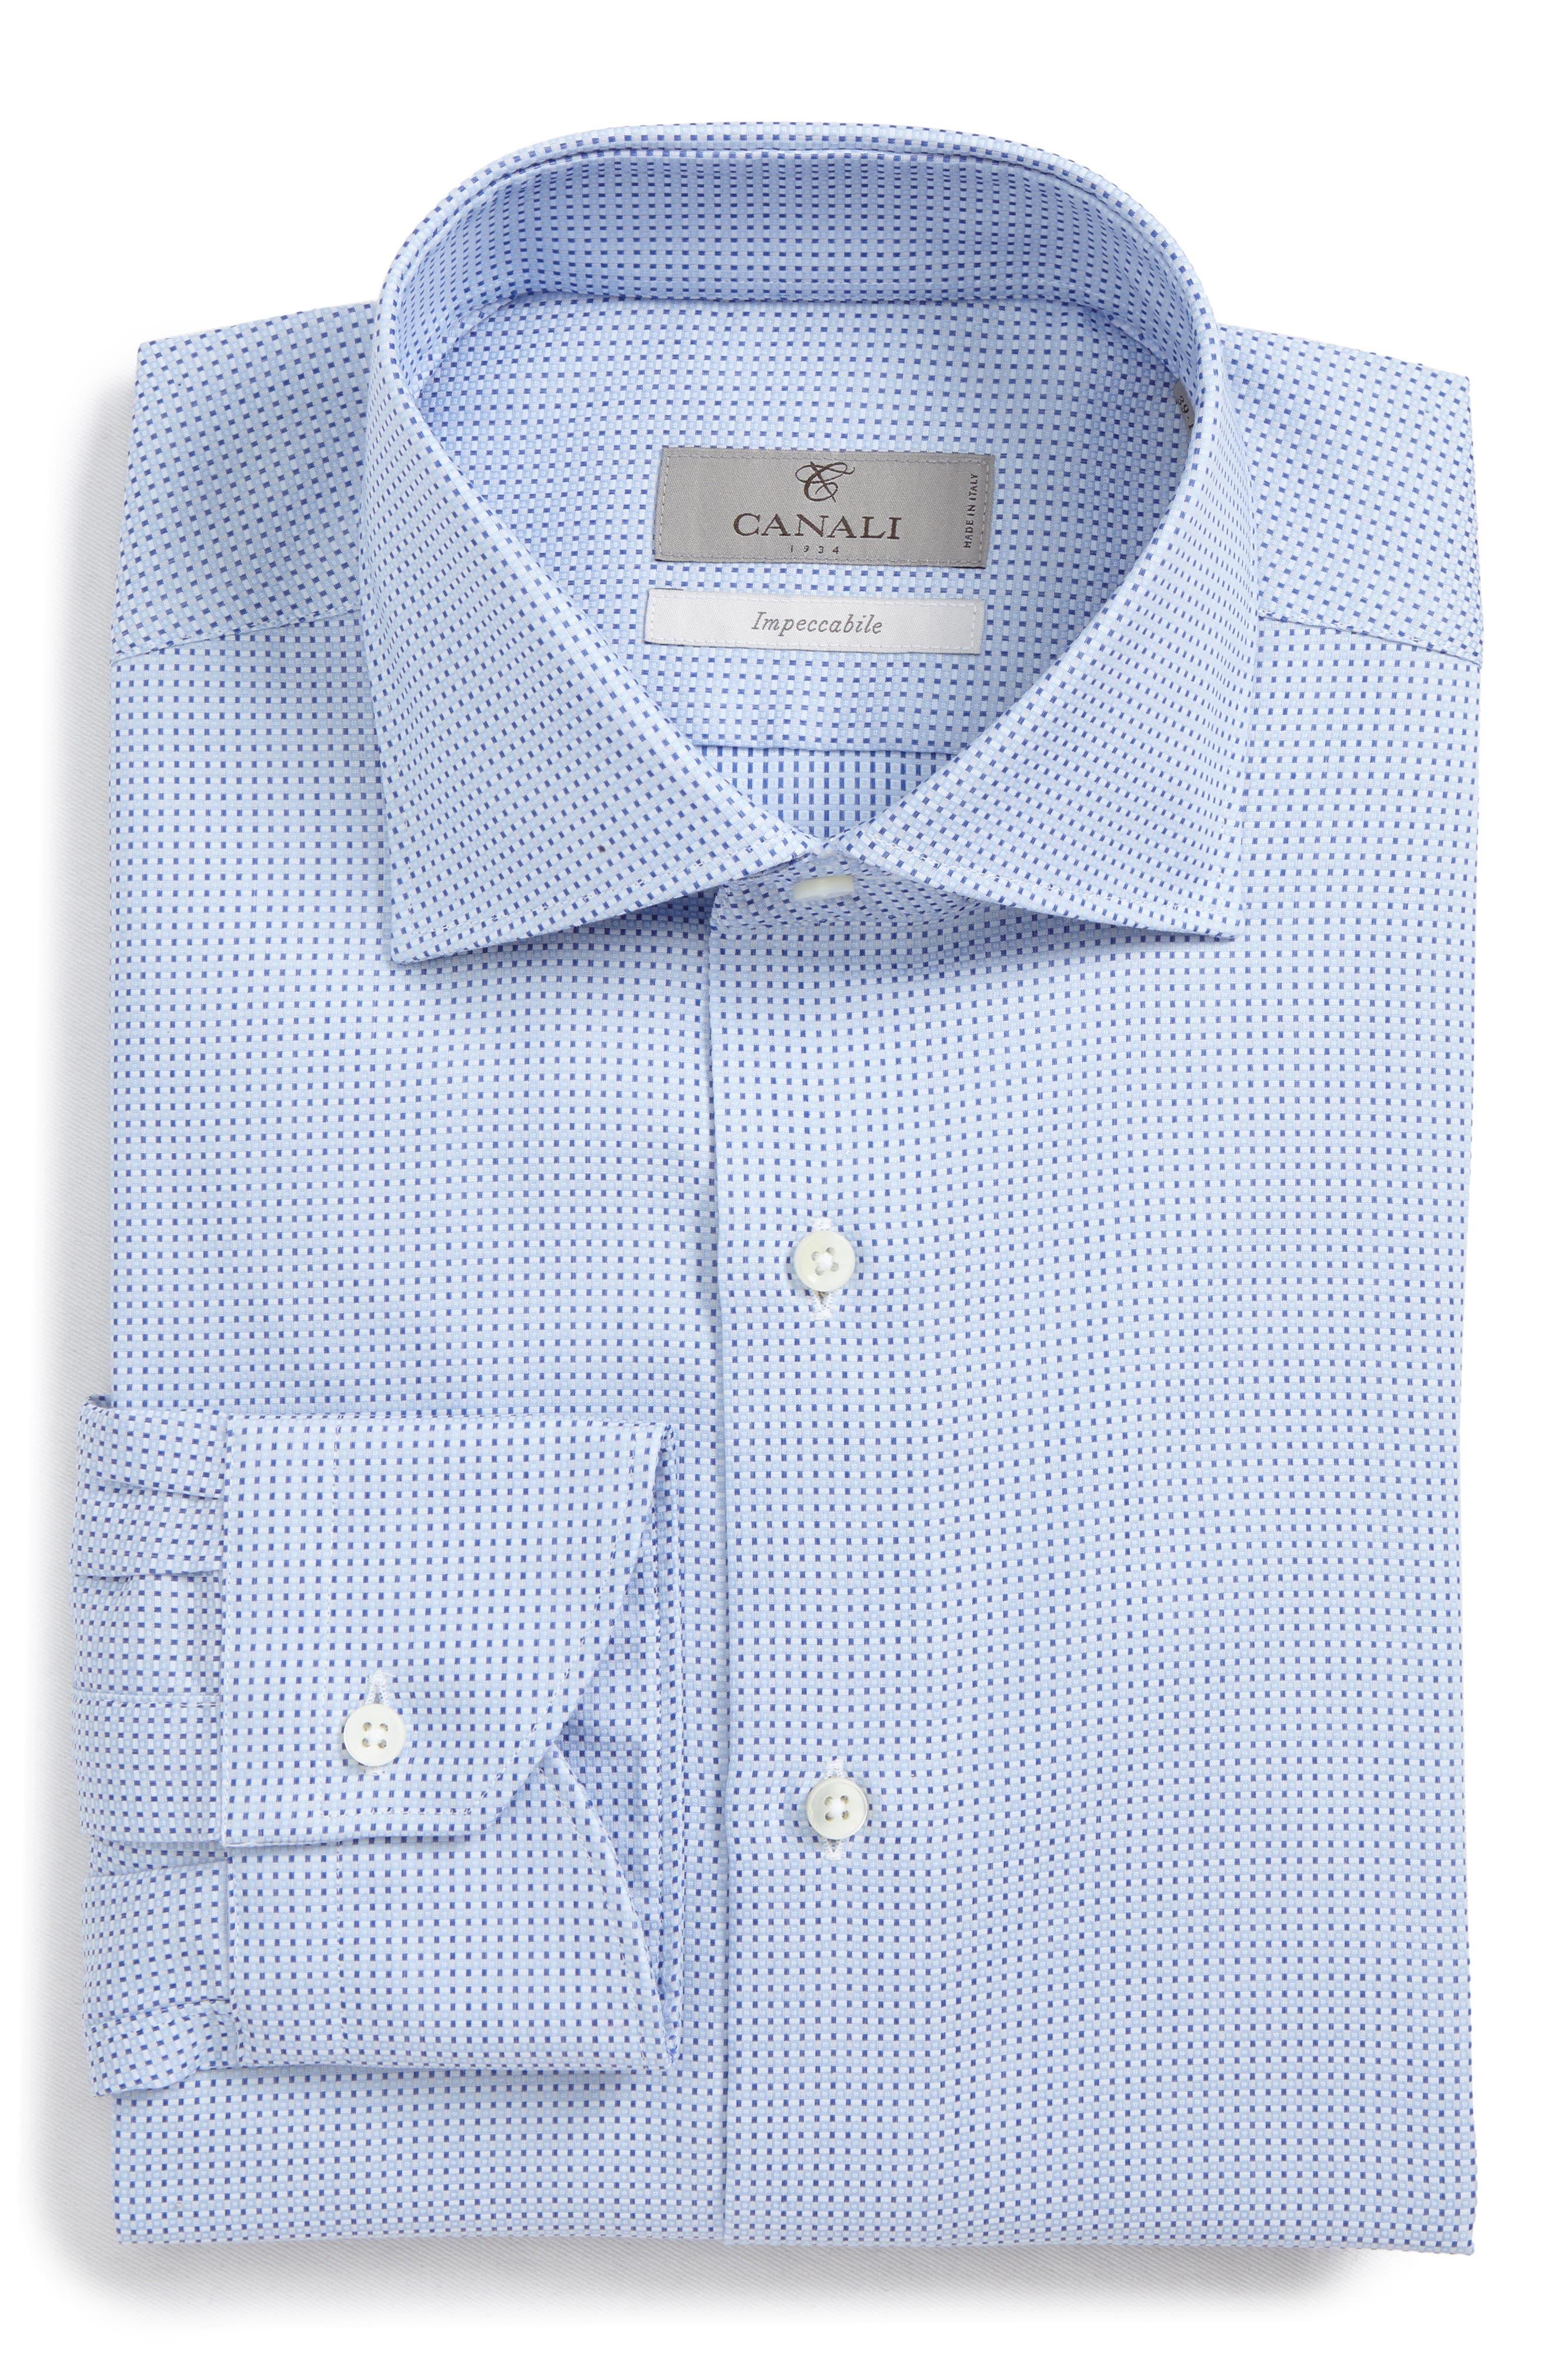 Regular Fit Geometric Dress Shirt,                             Main thumbnail 1, color,                             450